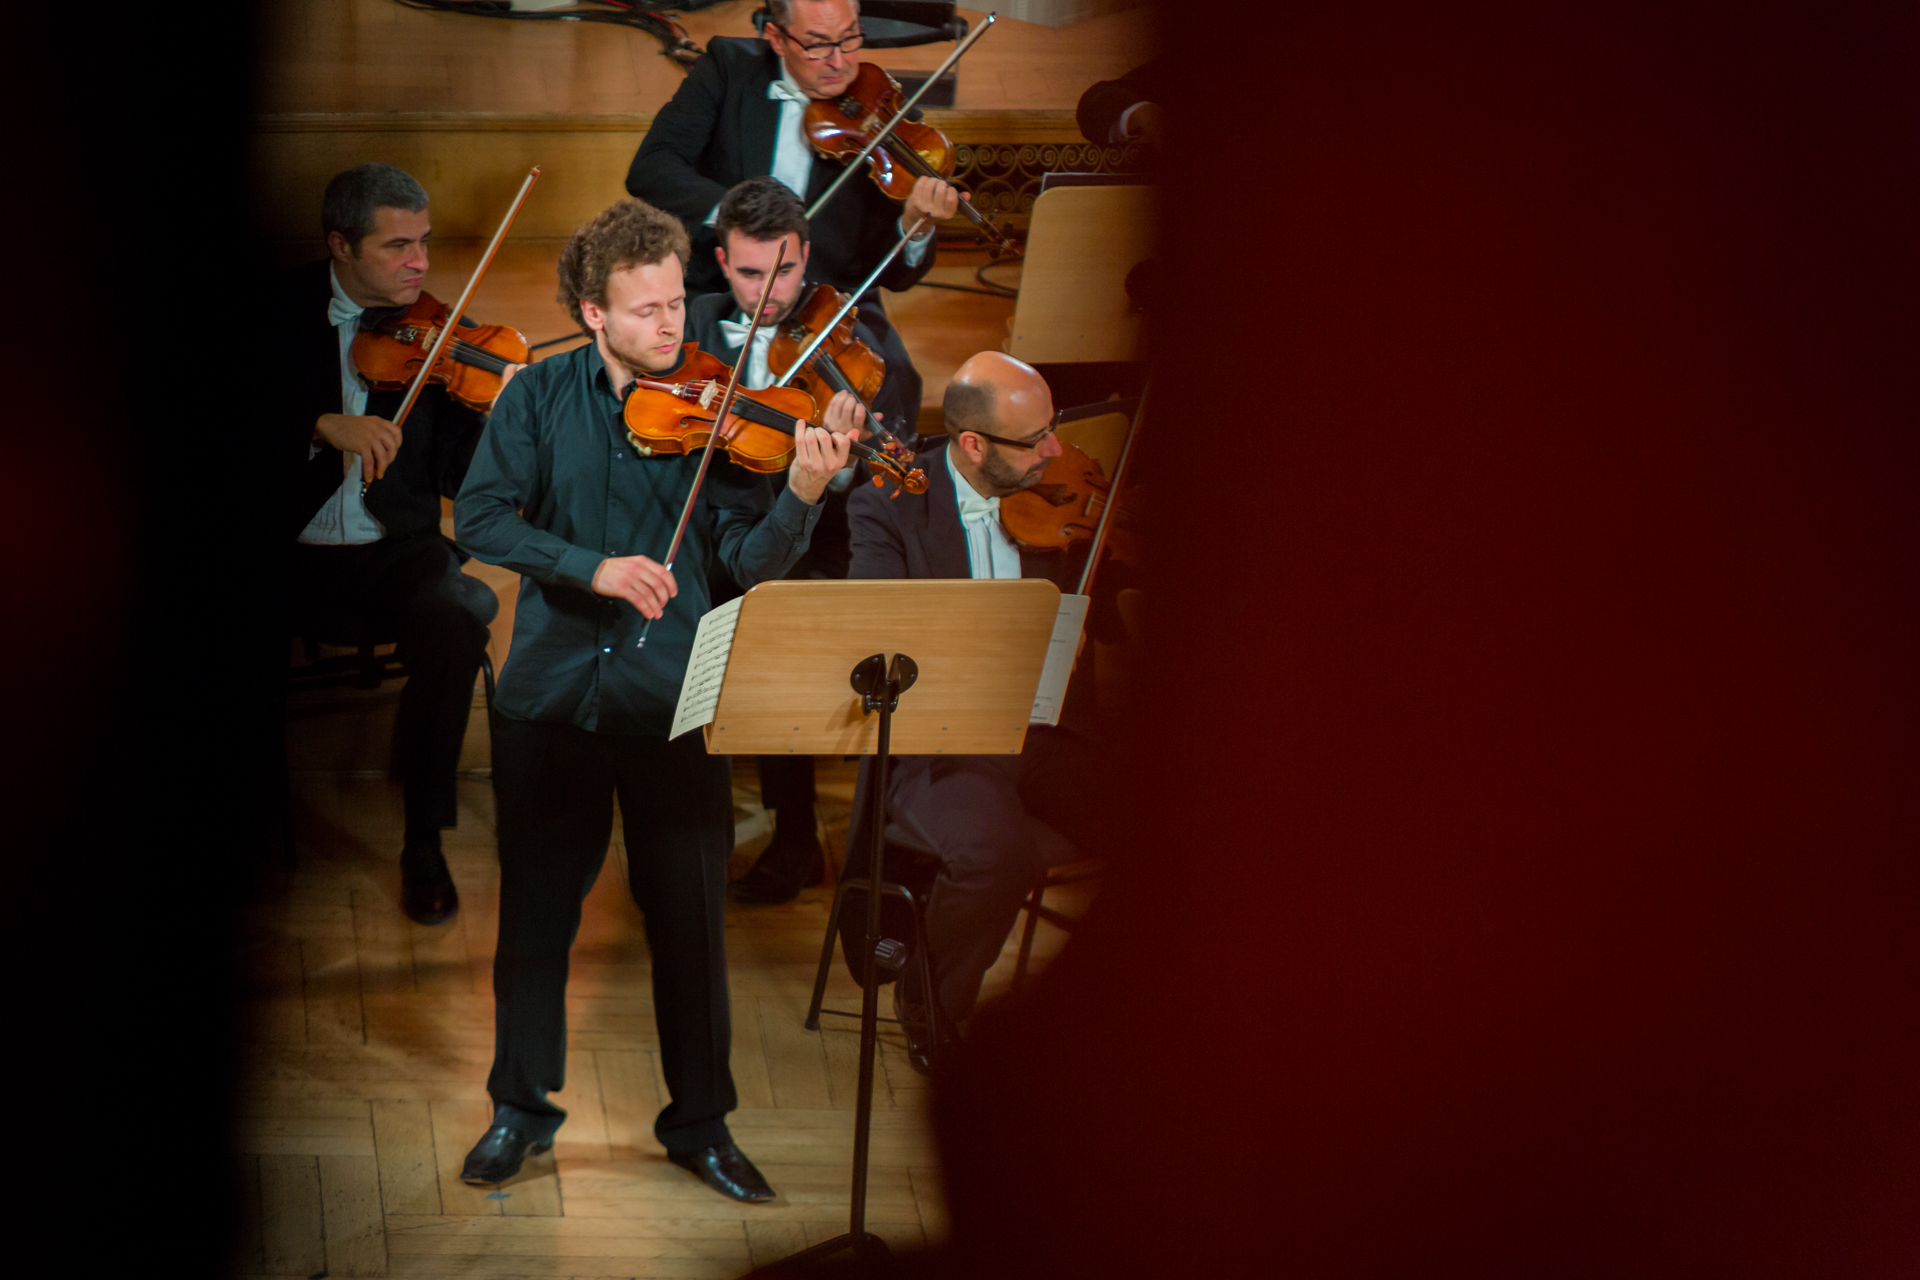 Arsenis Selalmazidis (Russia/Greece) - Stage 3 - 15th International H. Wieniawski Violin Competition BINAURAL | use headphones